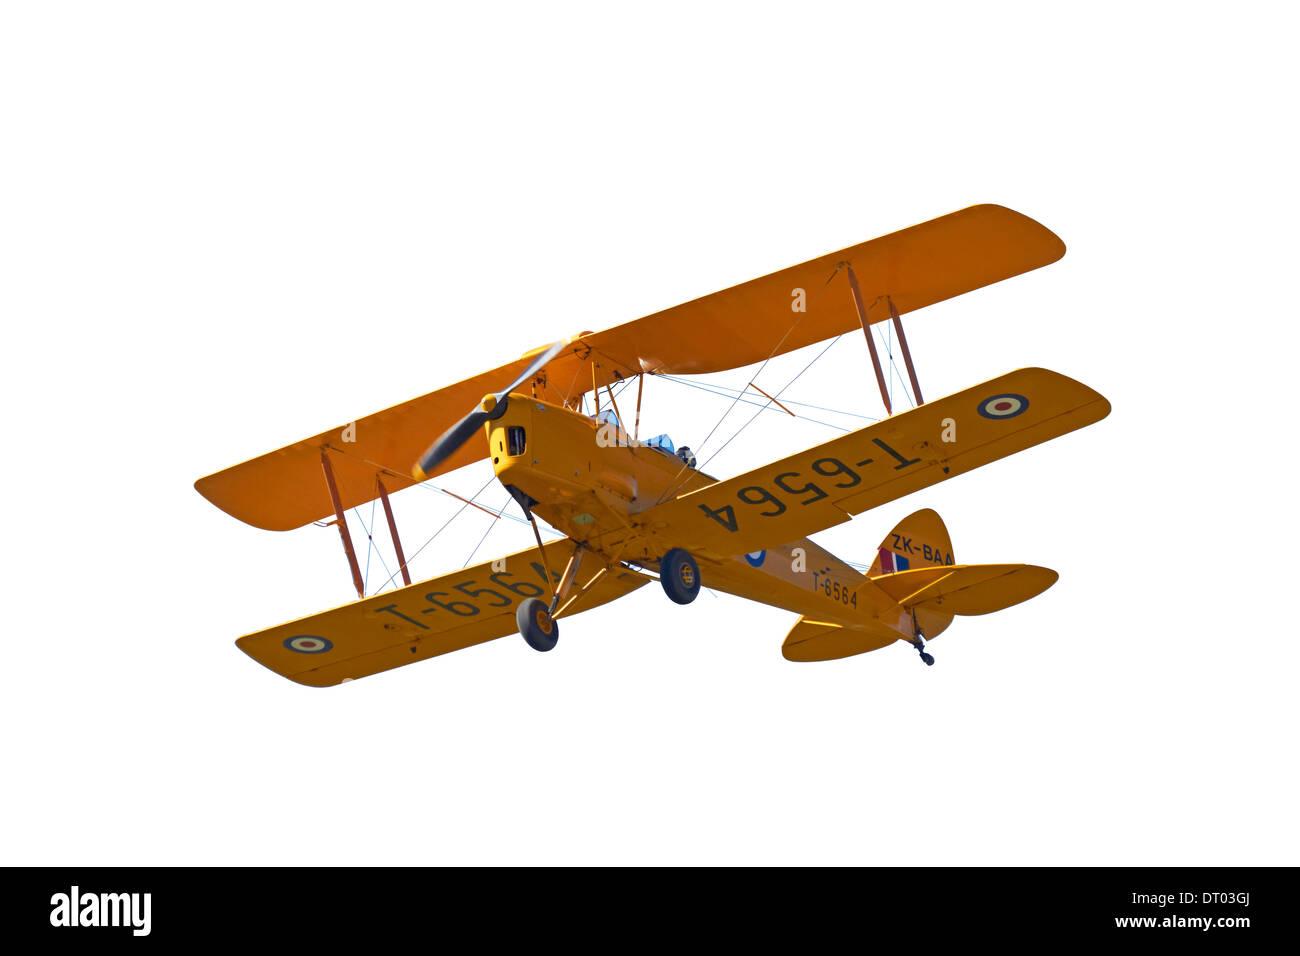 Cutout of De Havilland DH 82A Tiger Moth Biplane - Stock Image